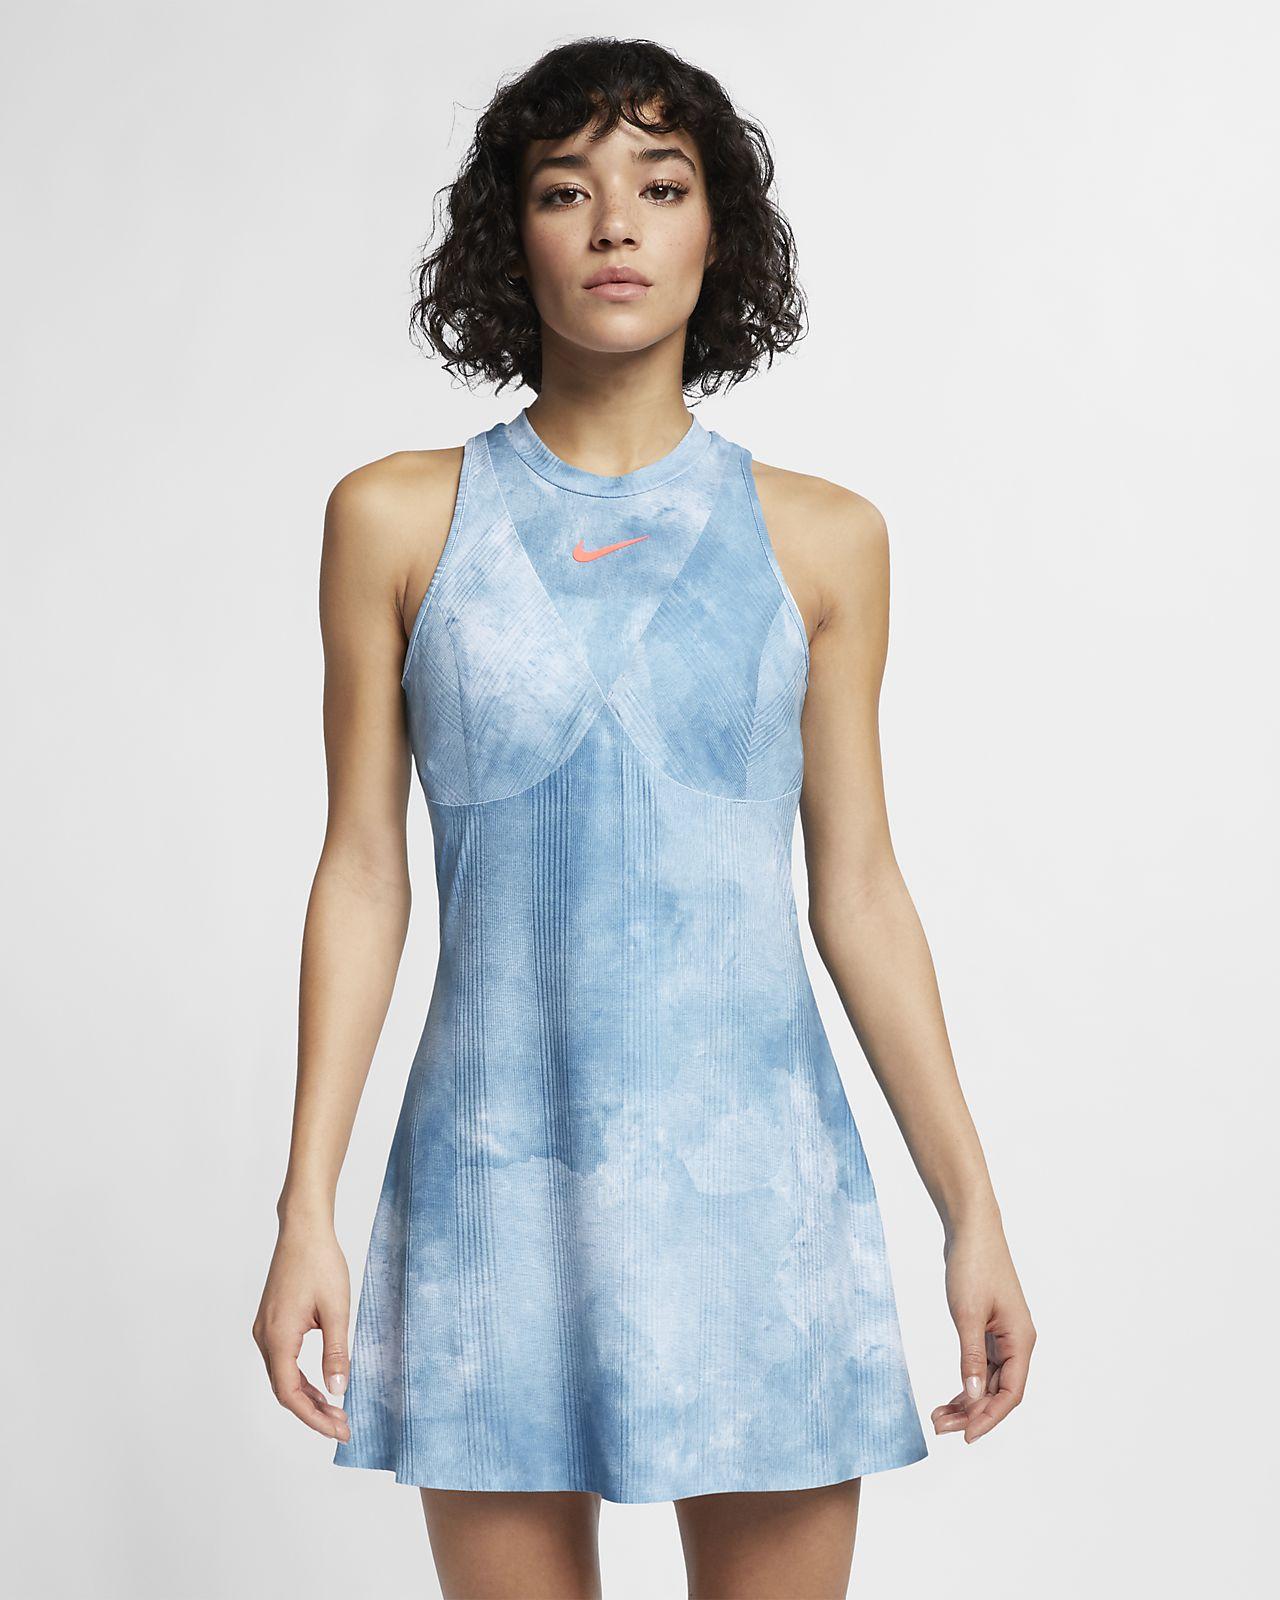 Dámské šaty NikeCourt Dri-FIT Maria s potiskem. Nike.com CZ 9d559296324